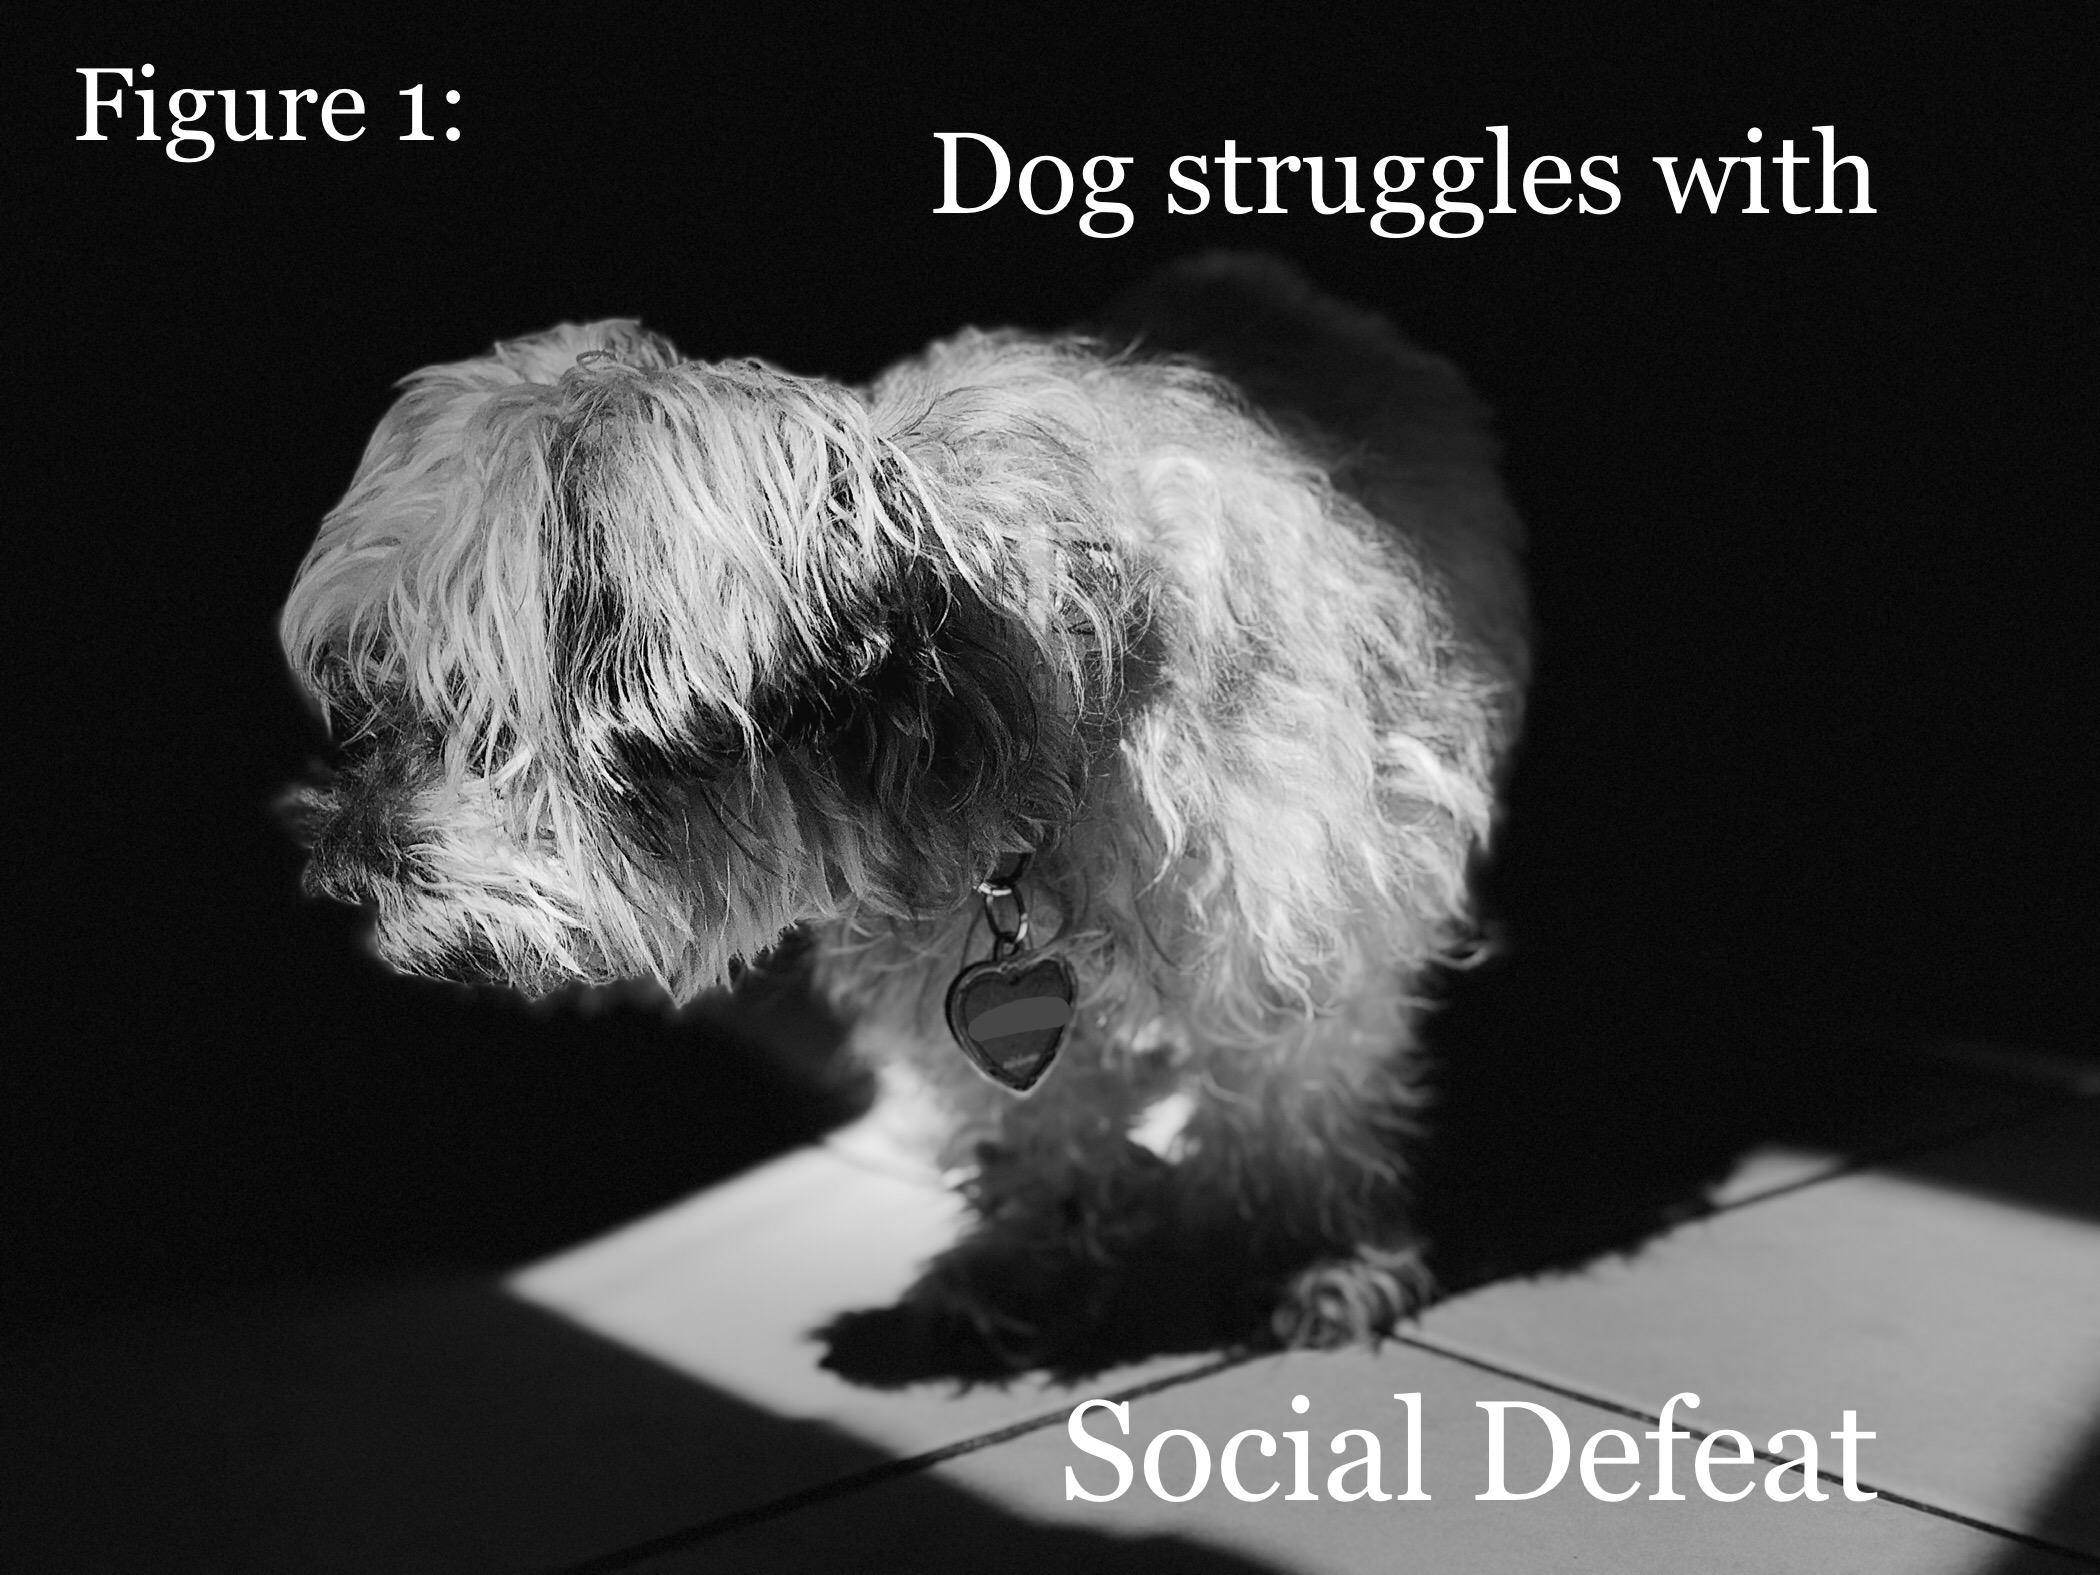 socialdefeat.jpg